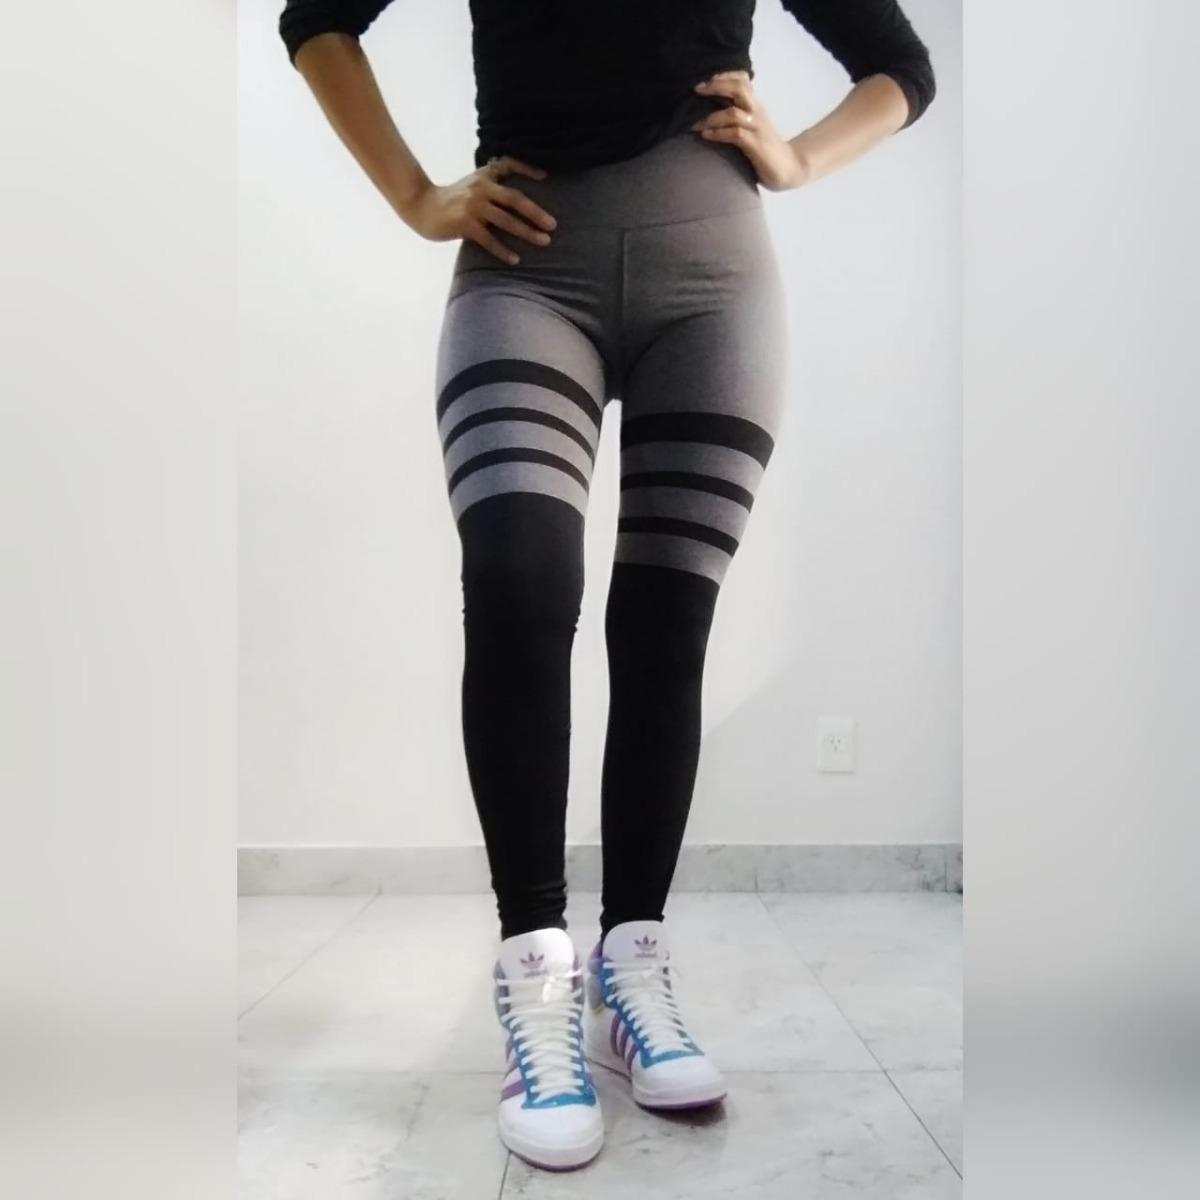 Calzas Deportivas De Mujer Lycra Running Training Zumba -   729 021f80540615